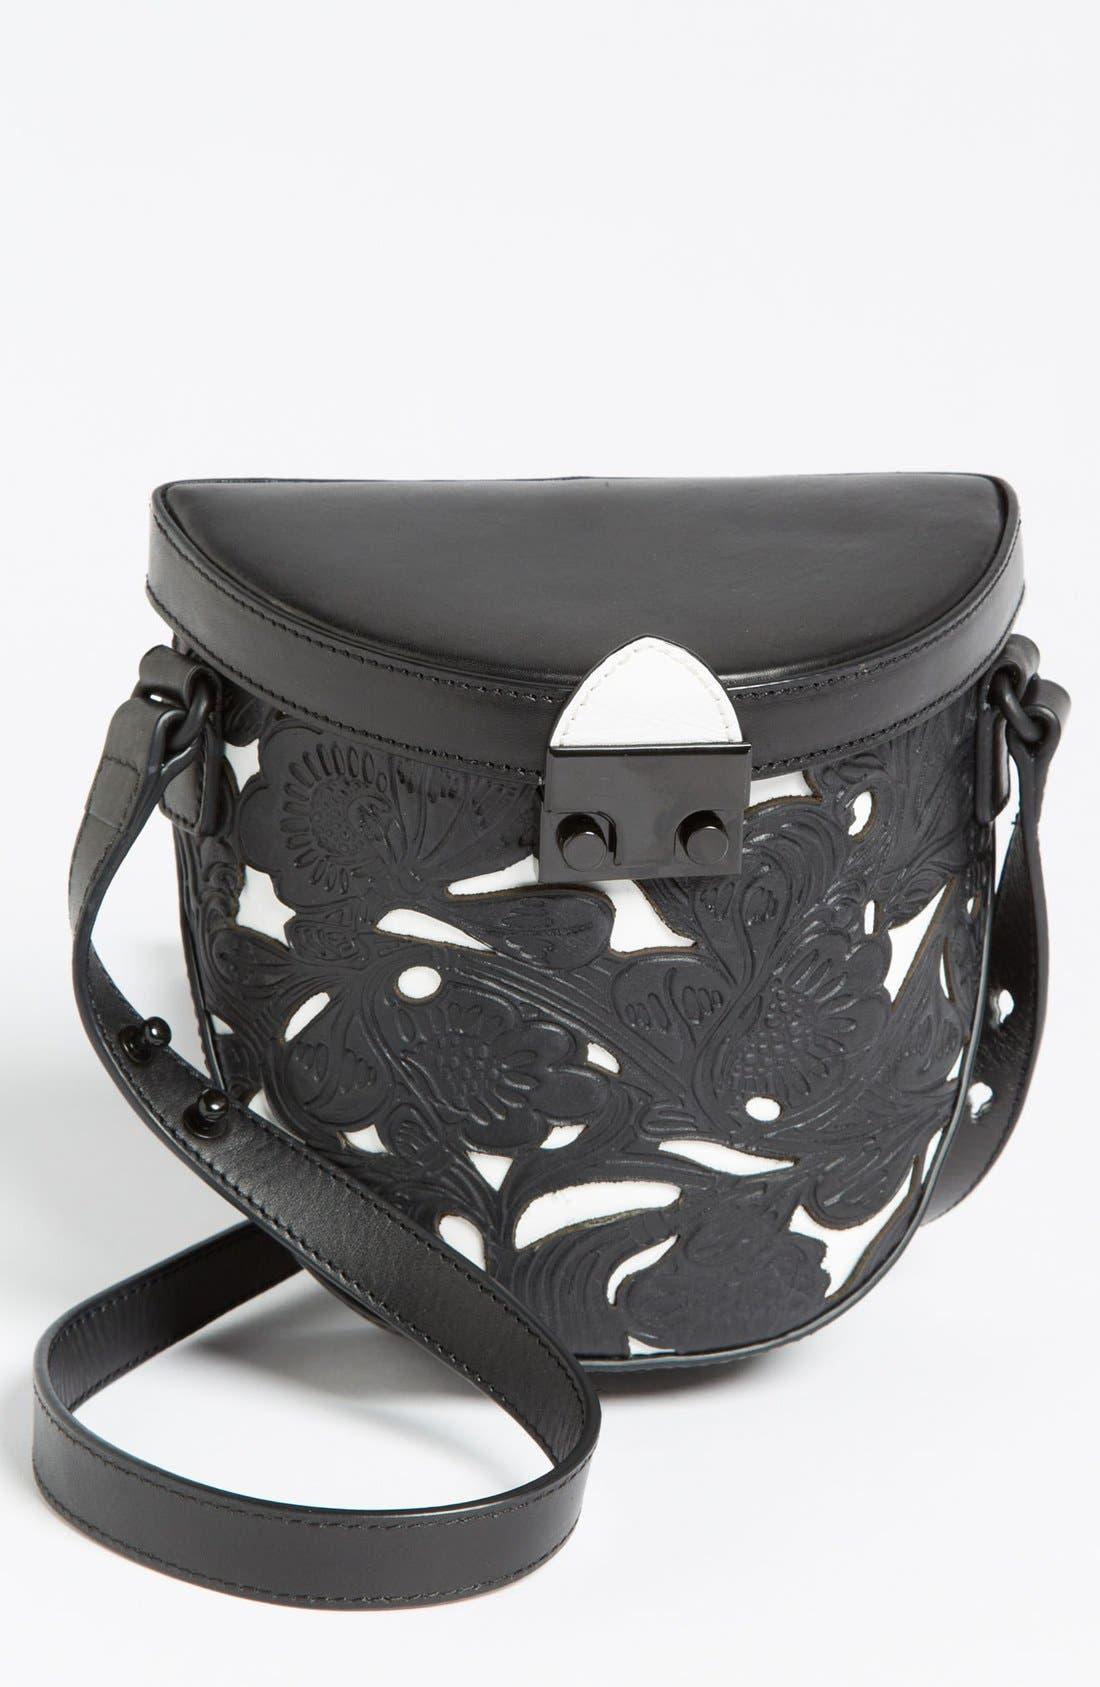 Main Image - Loeffler Randall 'Shooter' Leather Crossbody Bag, Small